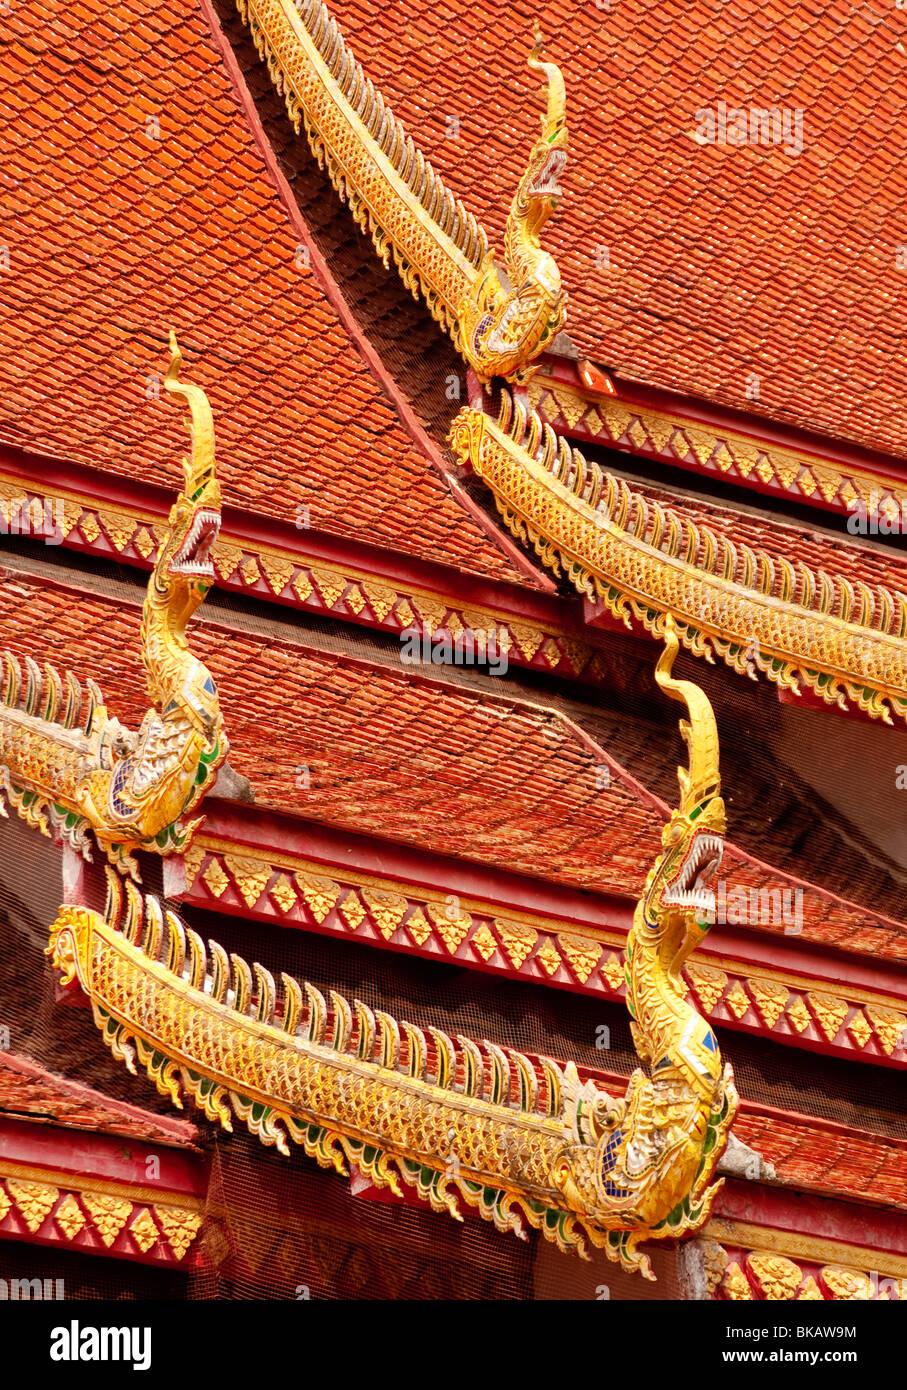 Detalle del techo en Wat Chetawan templo budista en Chiang Mai, Tailandia. Imagen De Stock